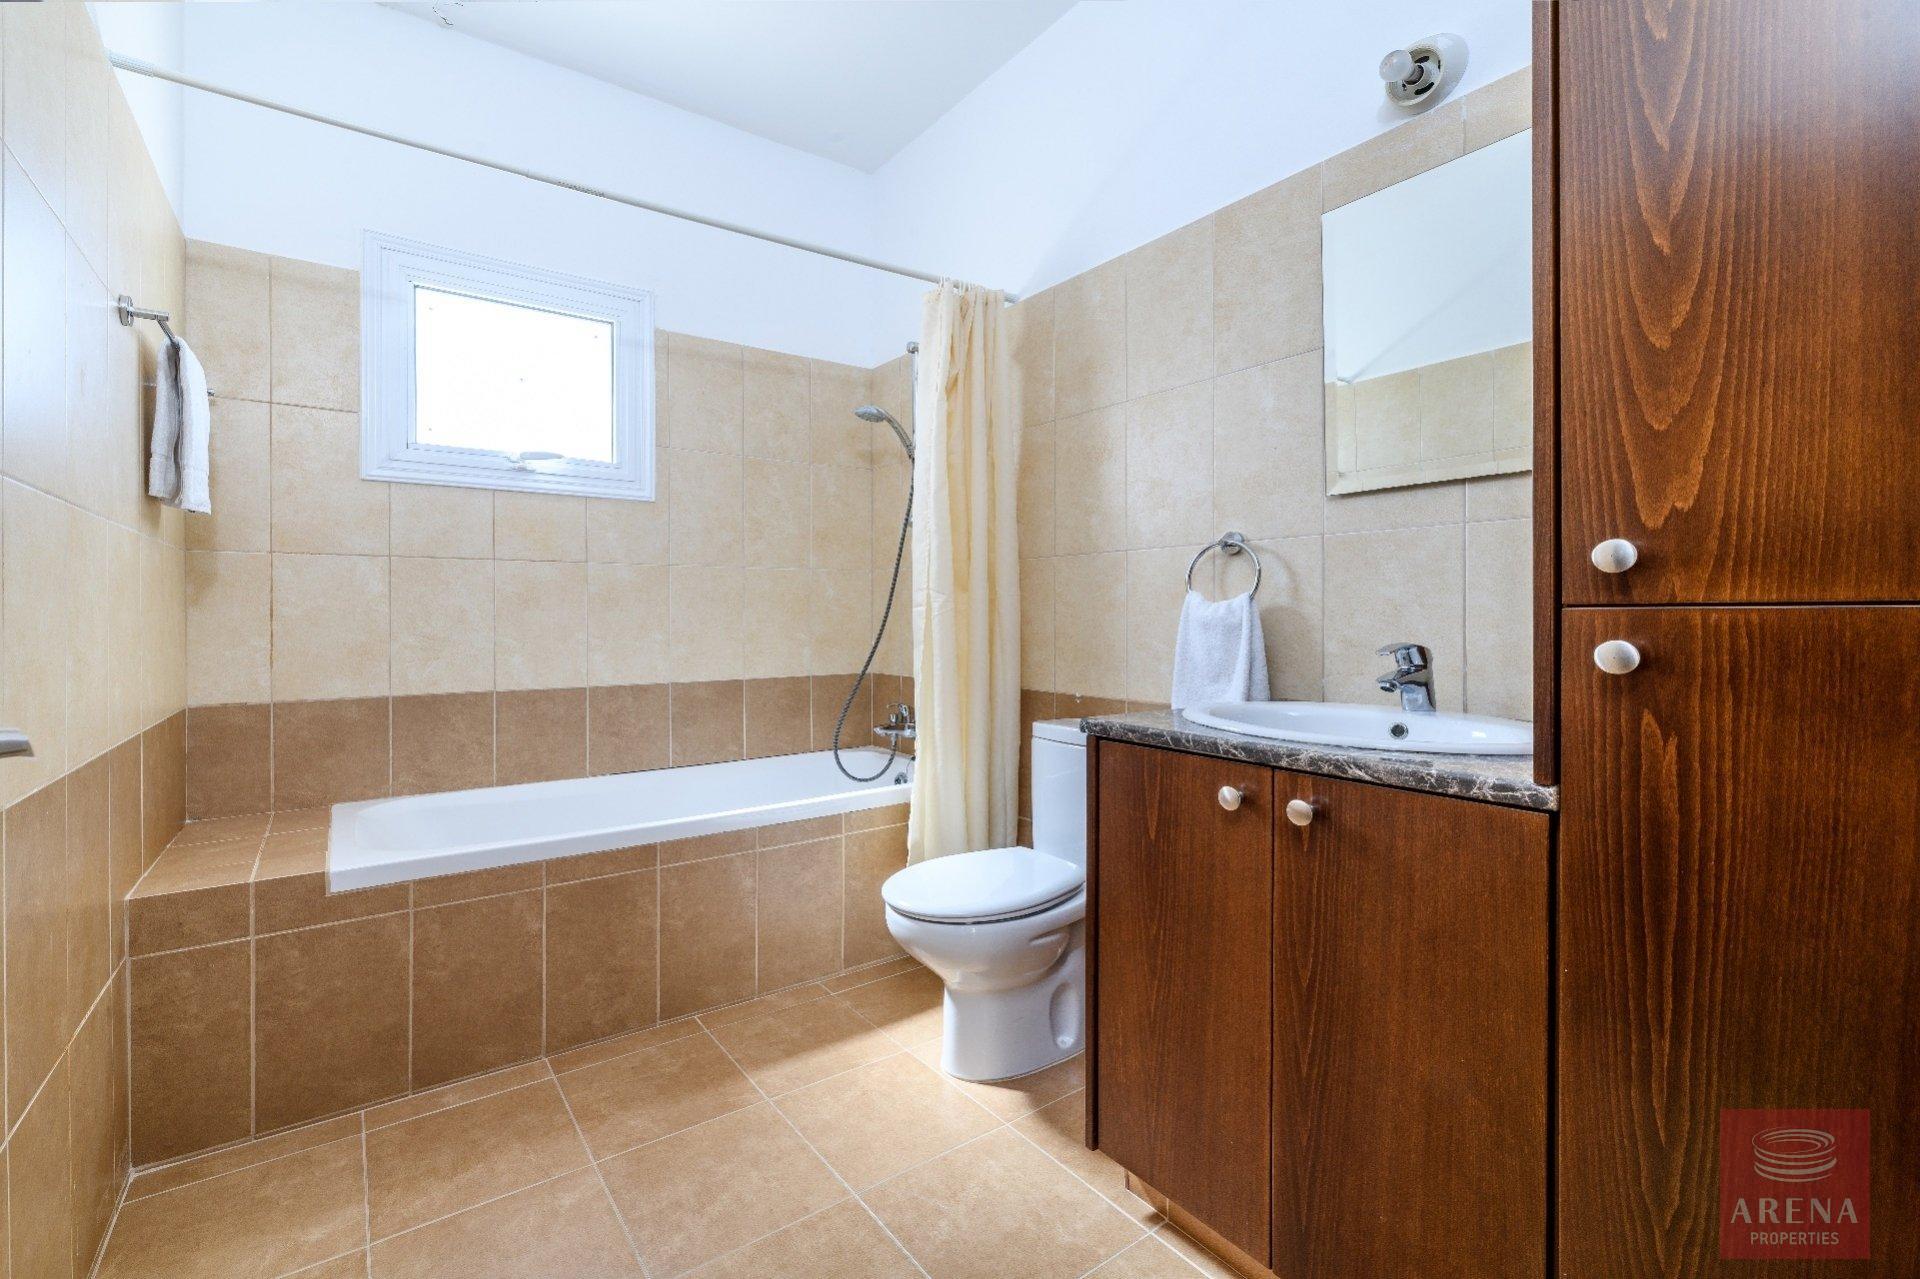 semi-detached house in paralimni - bathroom